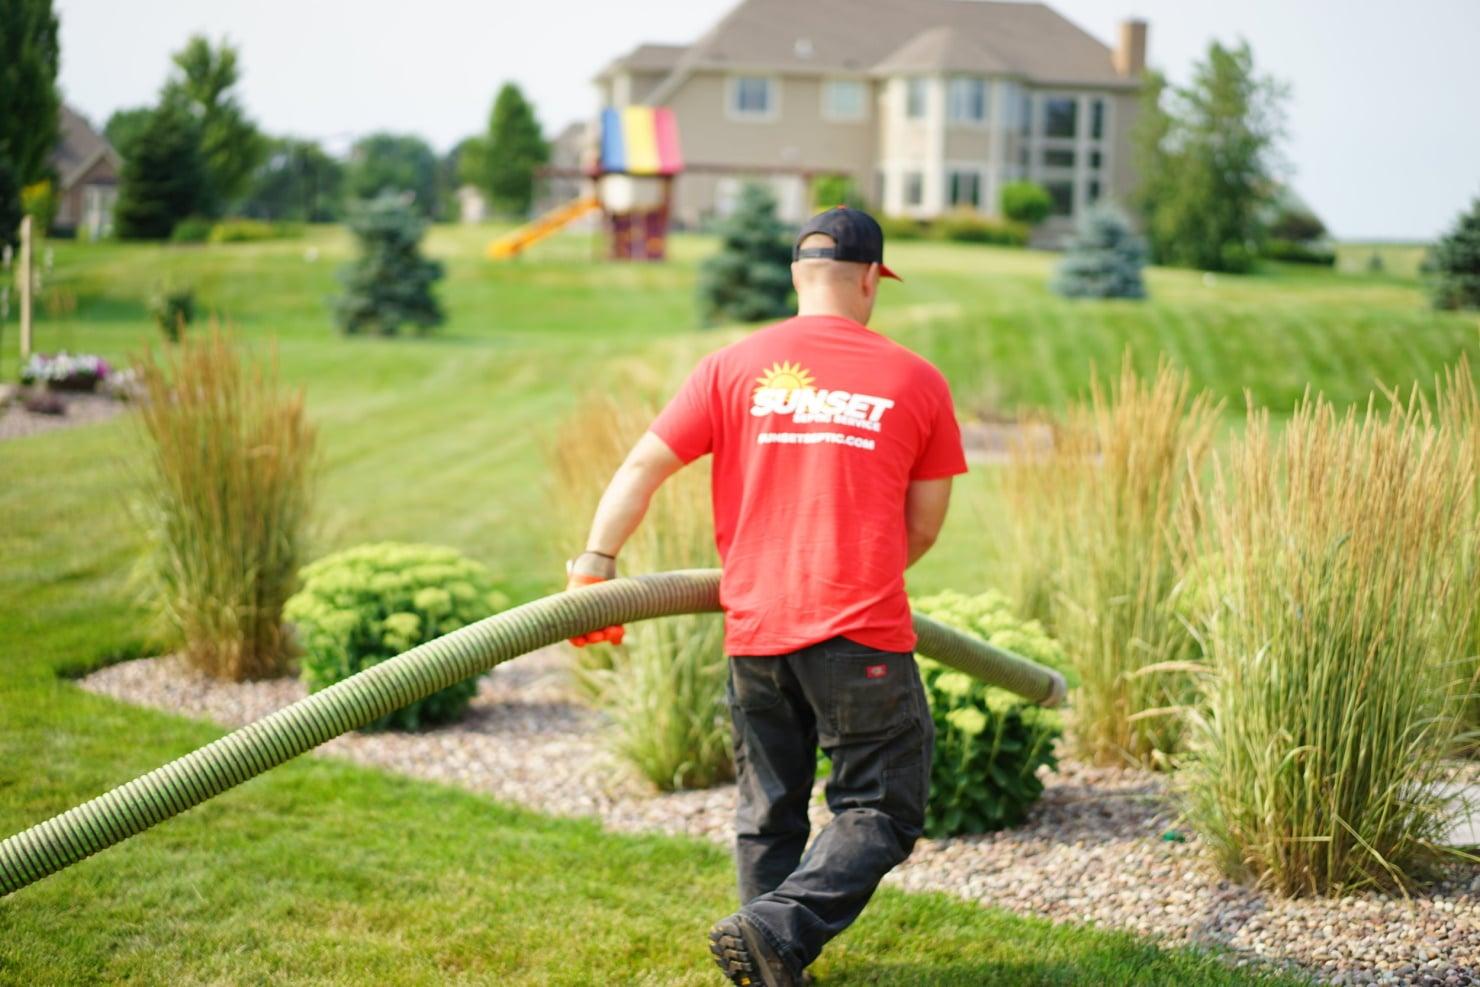 sunset-septic-worker-pulling-hose